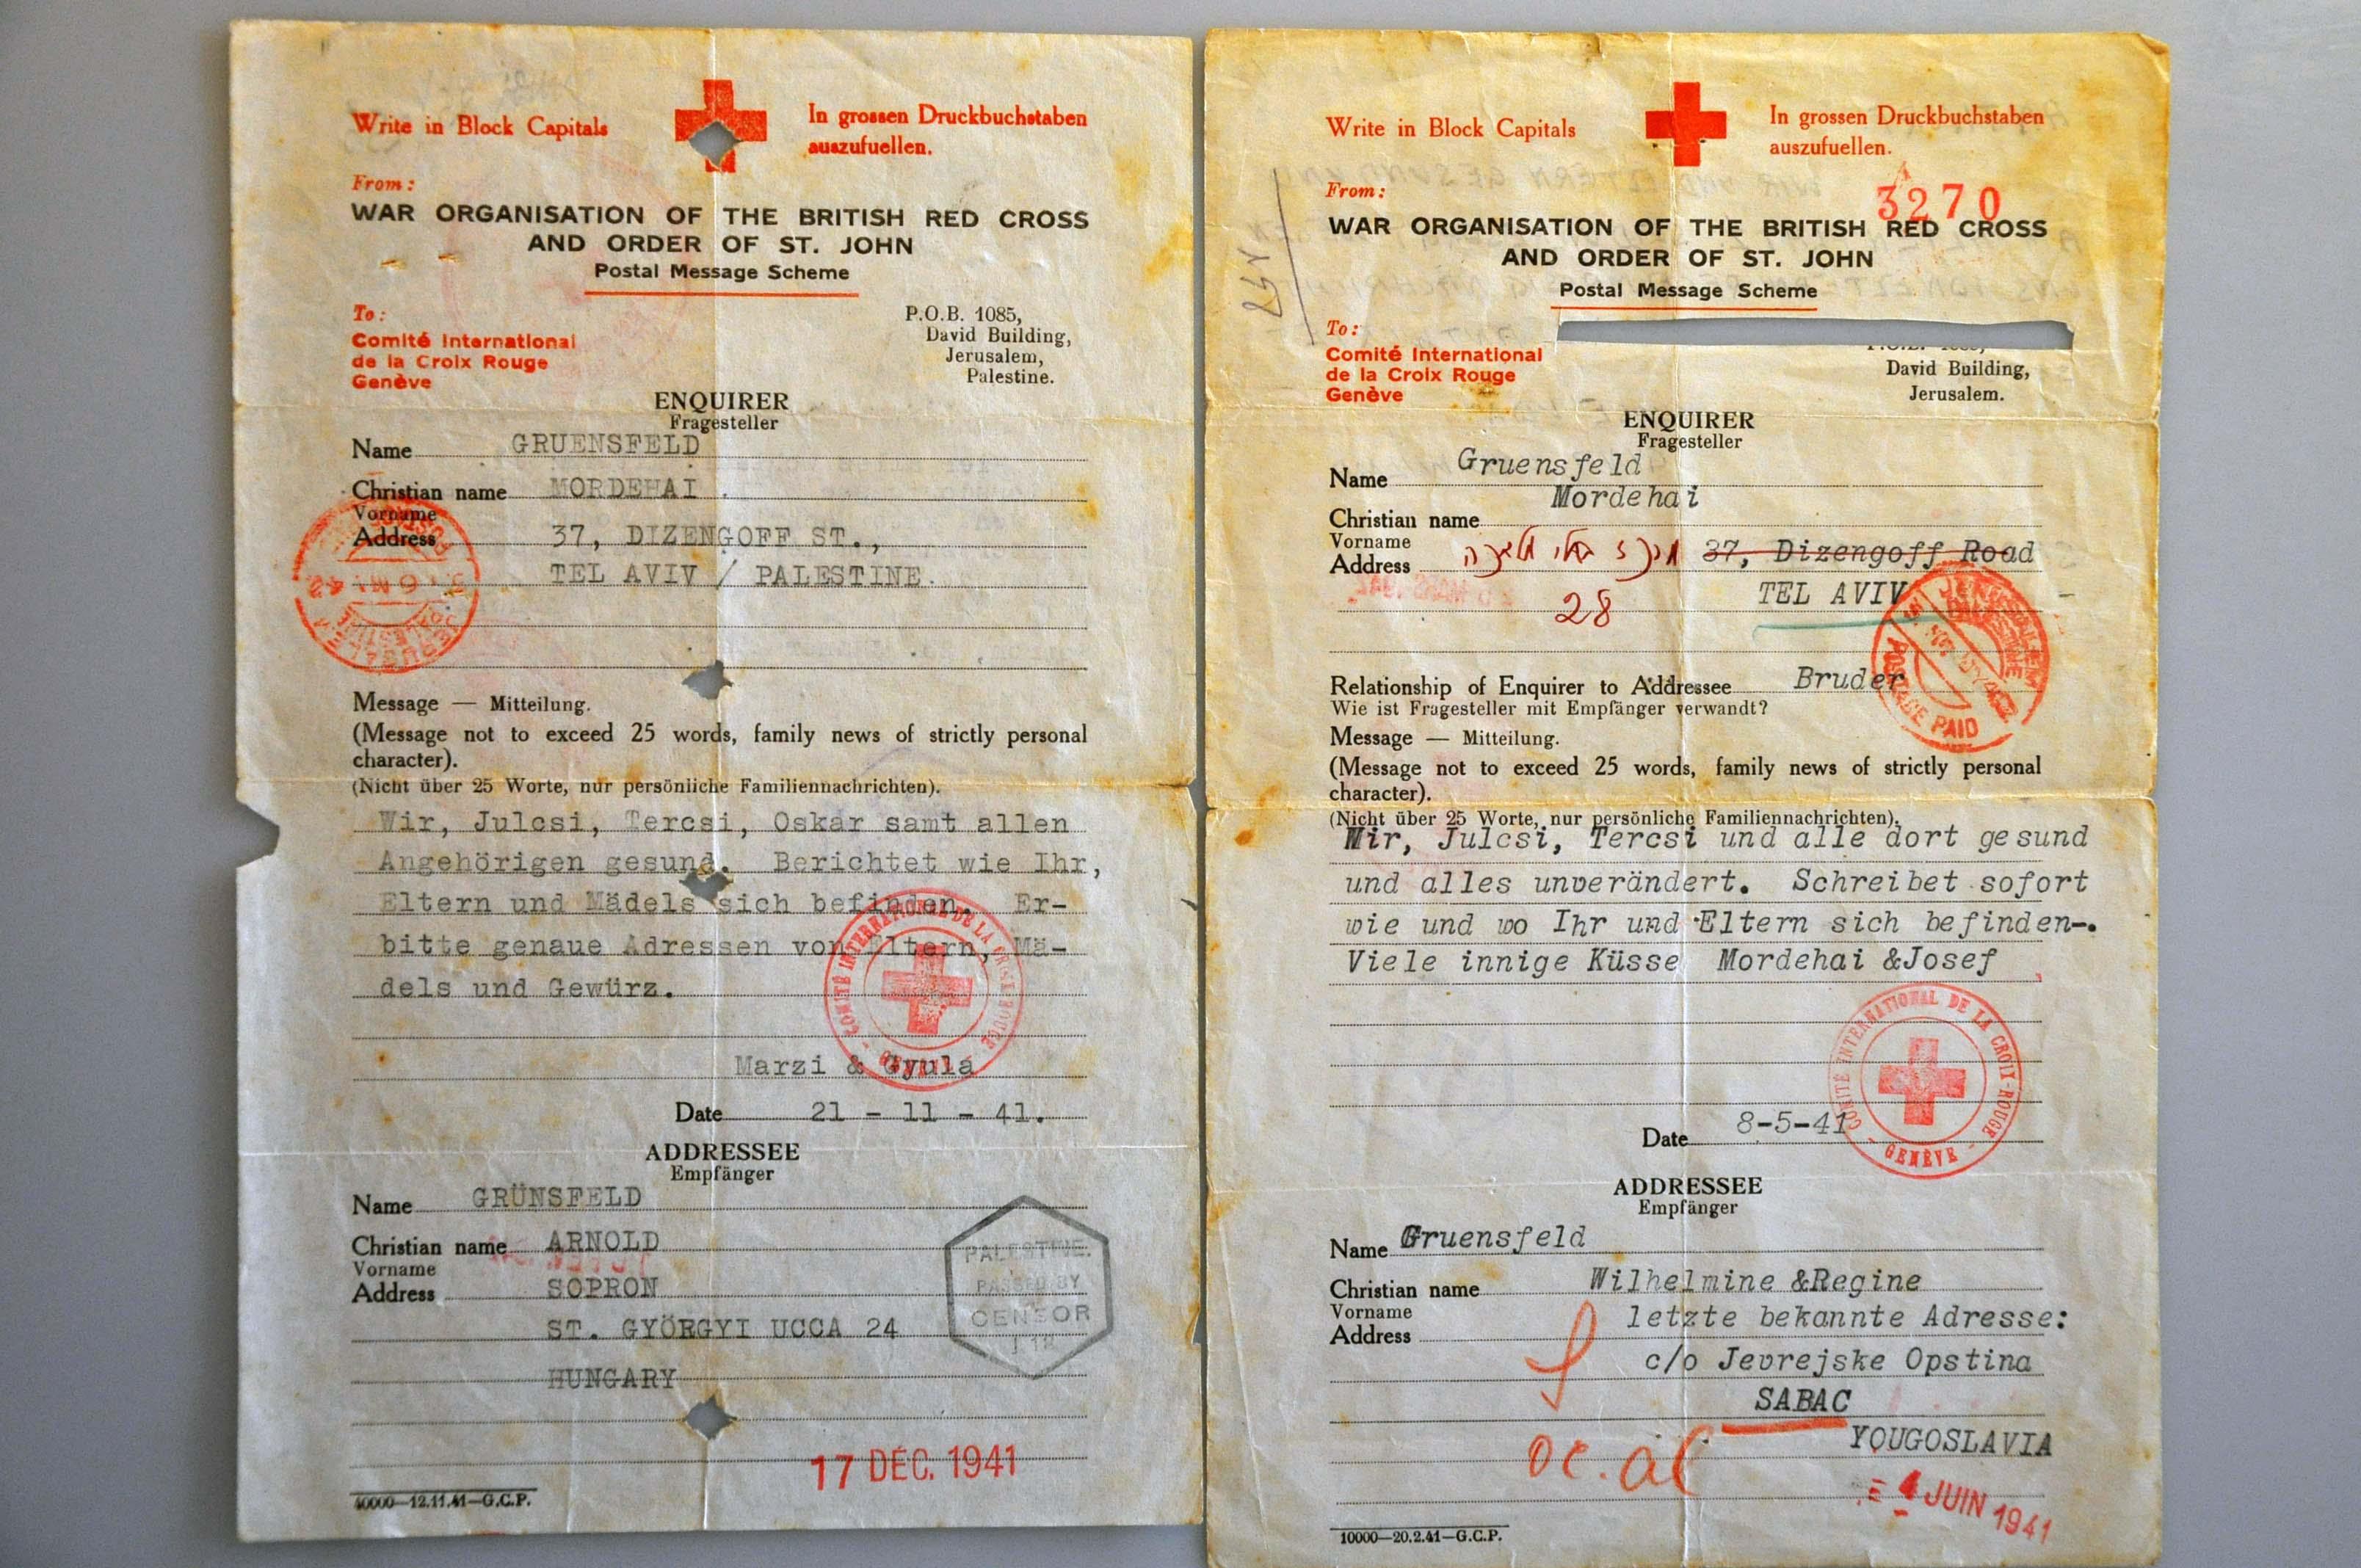 Lot 1000 - Topics and Miscellaneous world war II -  Corinphila veilingen Auction 235: Postal History WW2 - The Stefan Drukker Collection